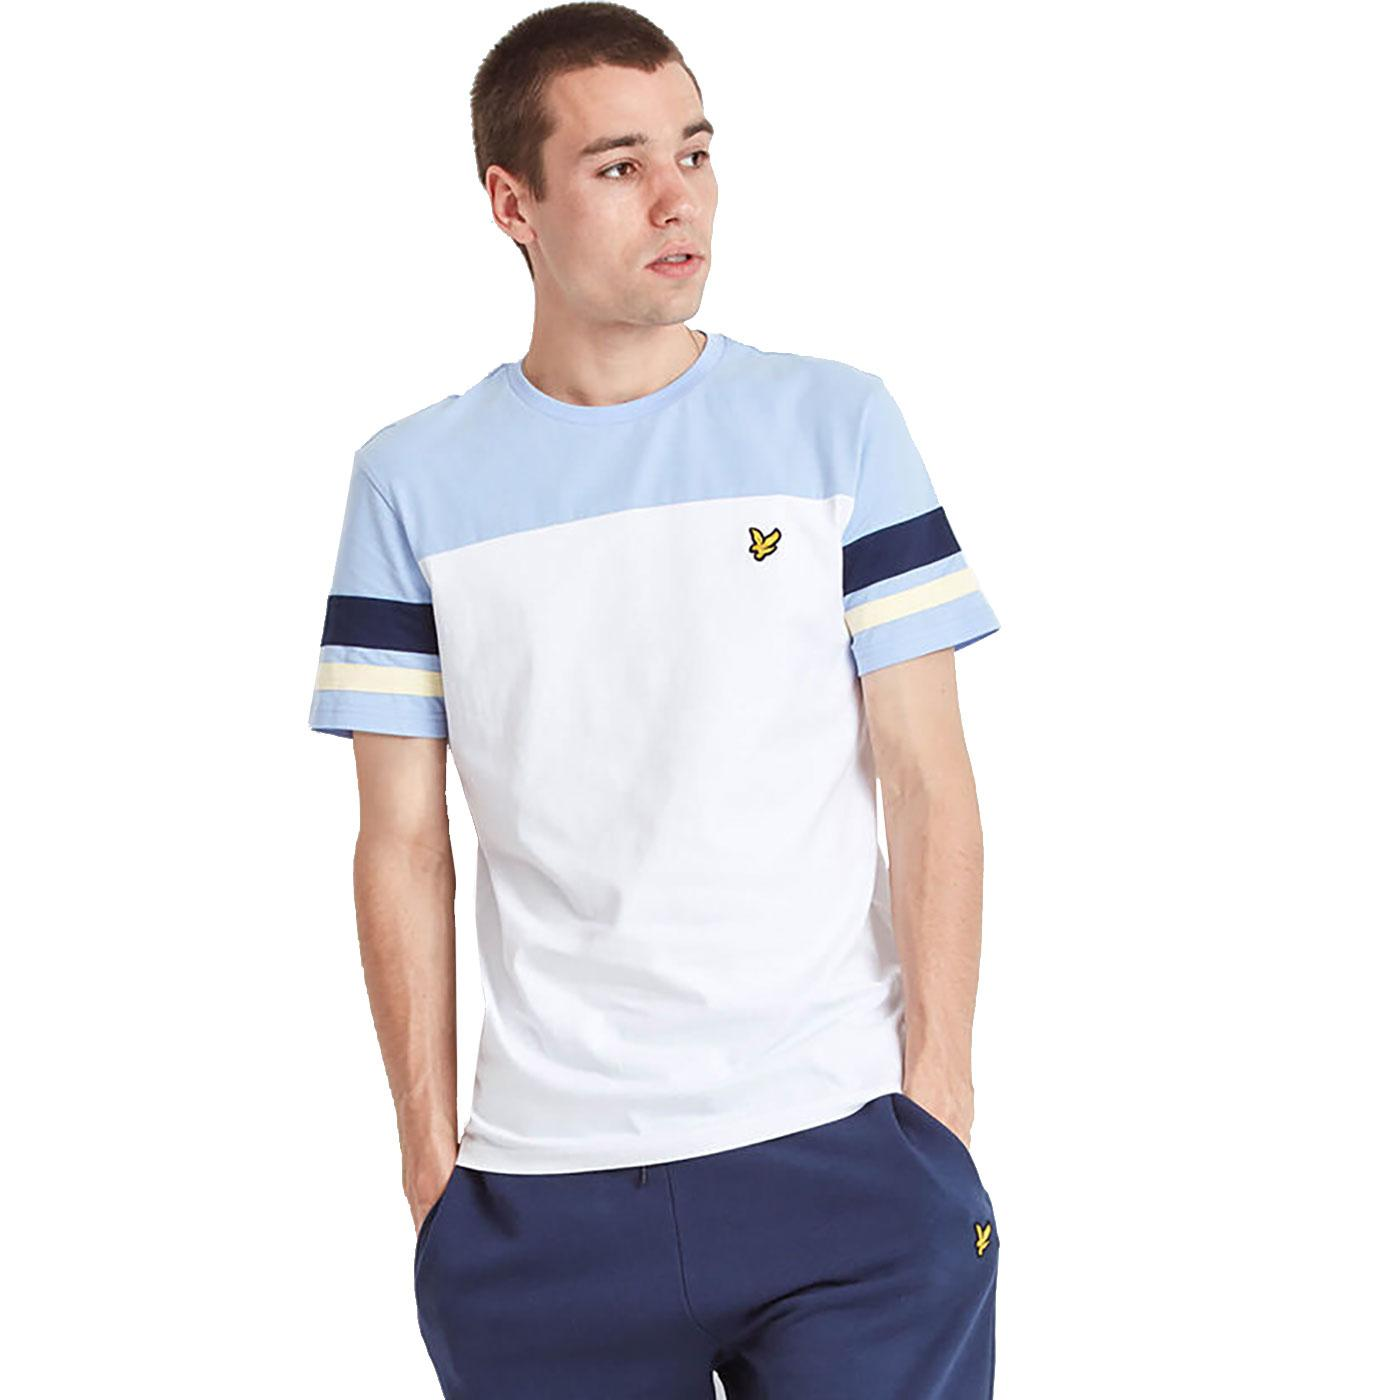 LYLE & SCOTT Men's Contrast Sleeve Band T-Shirt